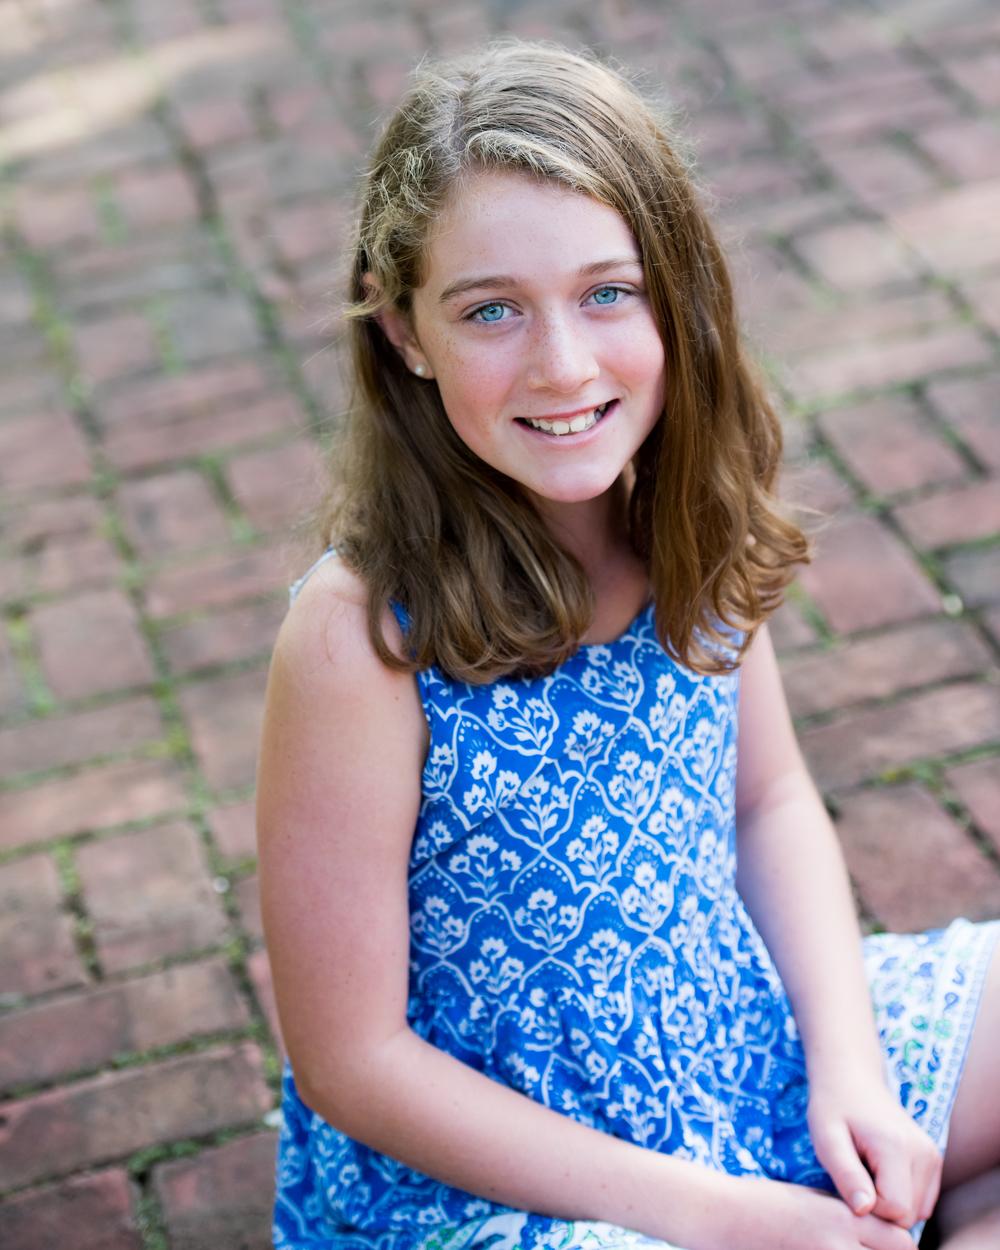 Northern Virginia Portrait Photographer    Northern Virginia Family Photographer  Northern Virginia Lifestyle Photographer  Northern Virginia Family Photographer